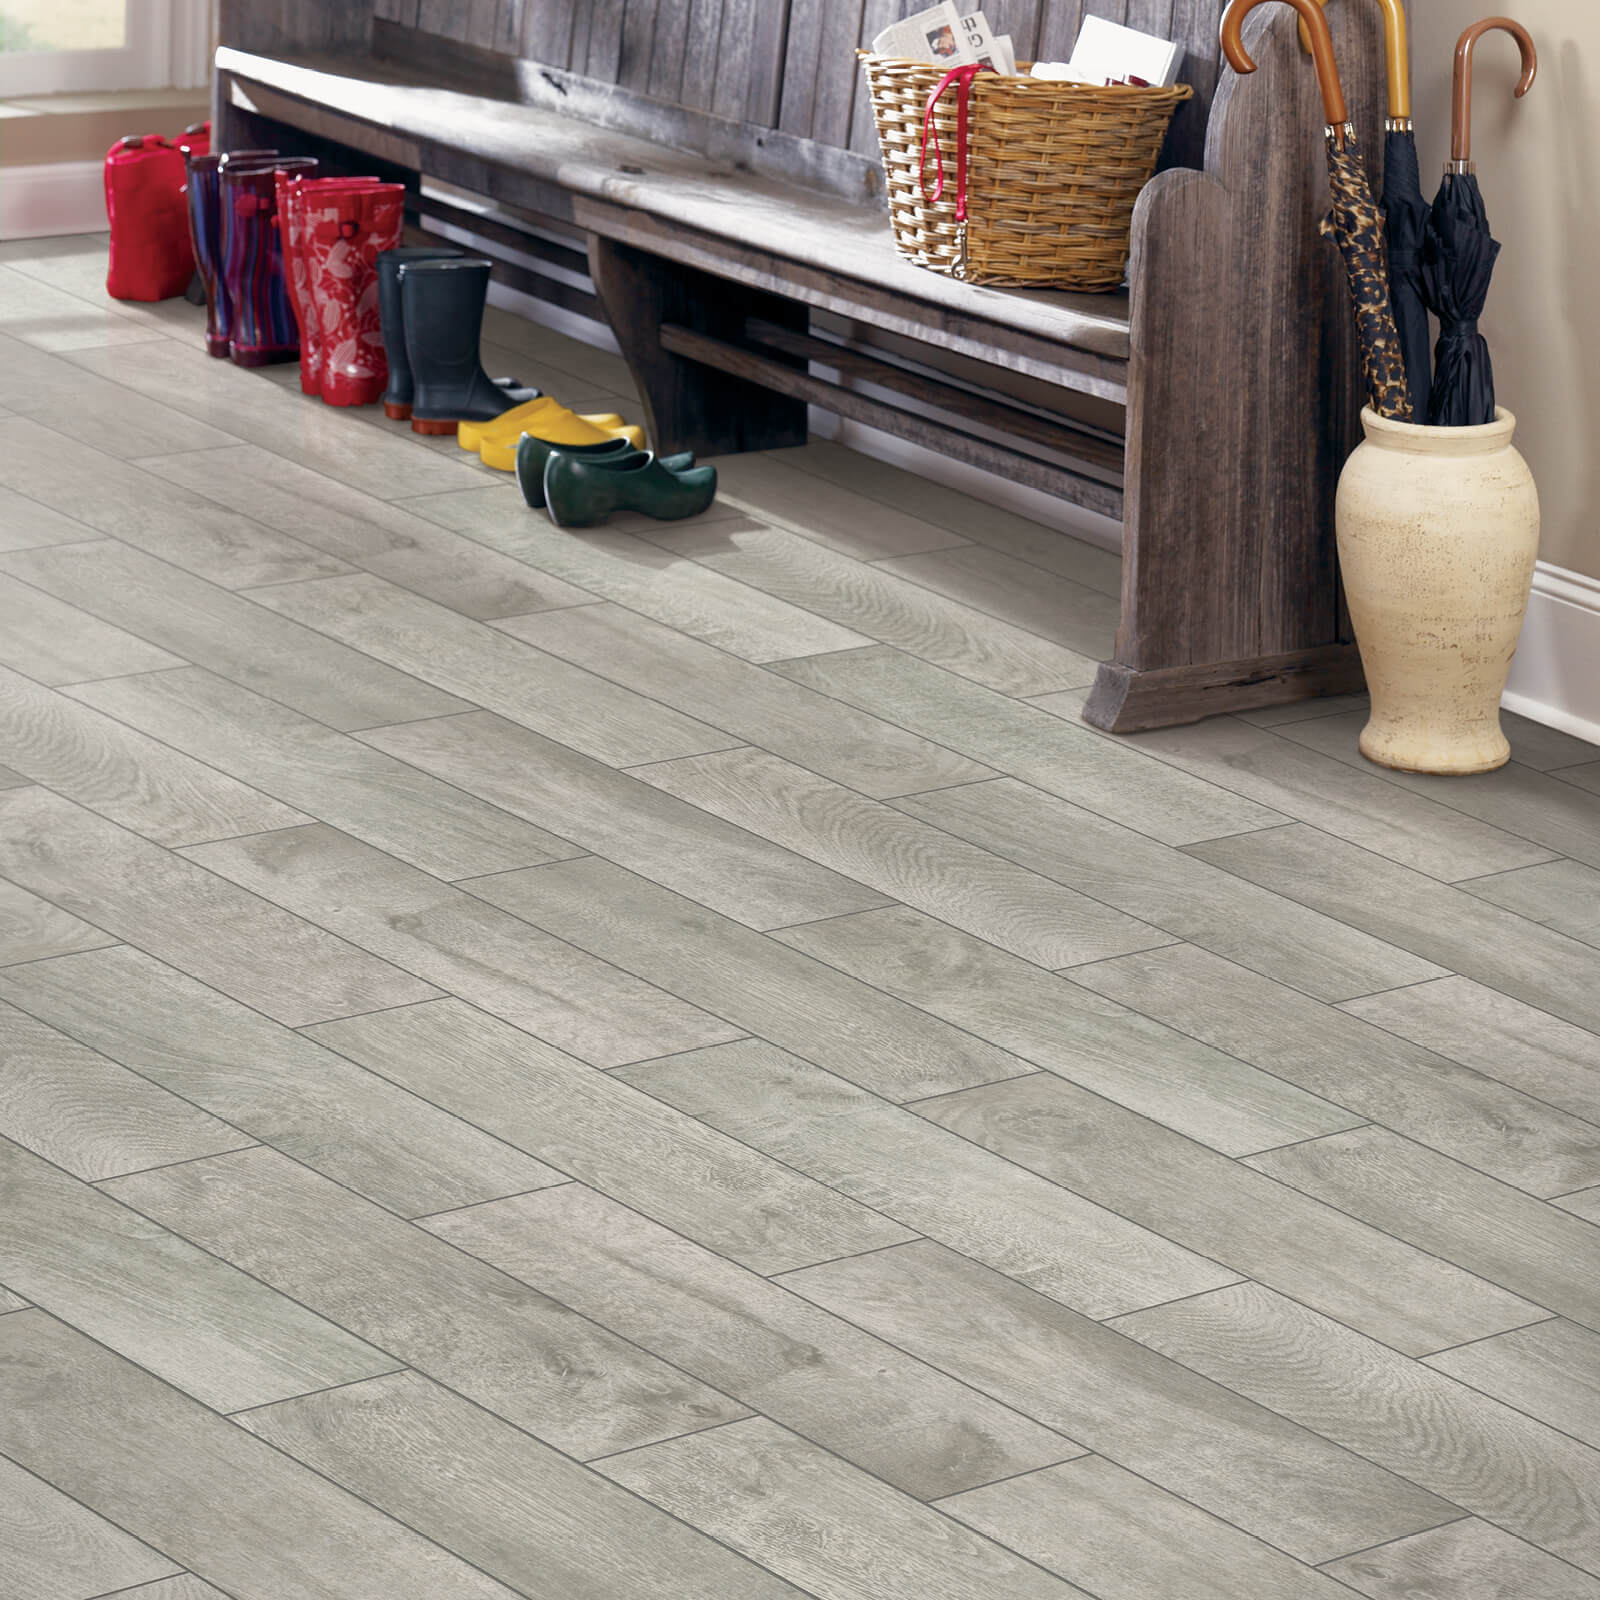 Laminated Flooring | McSwain Carpet & Floors